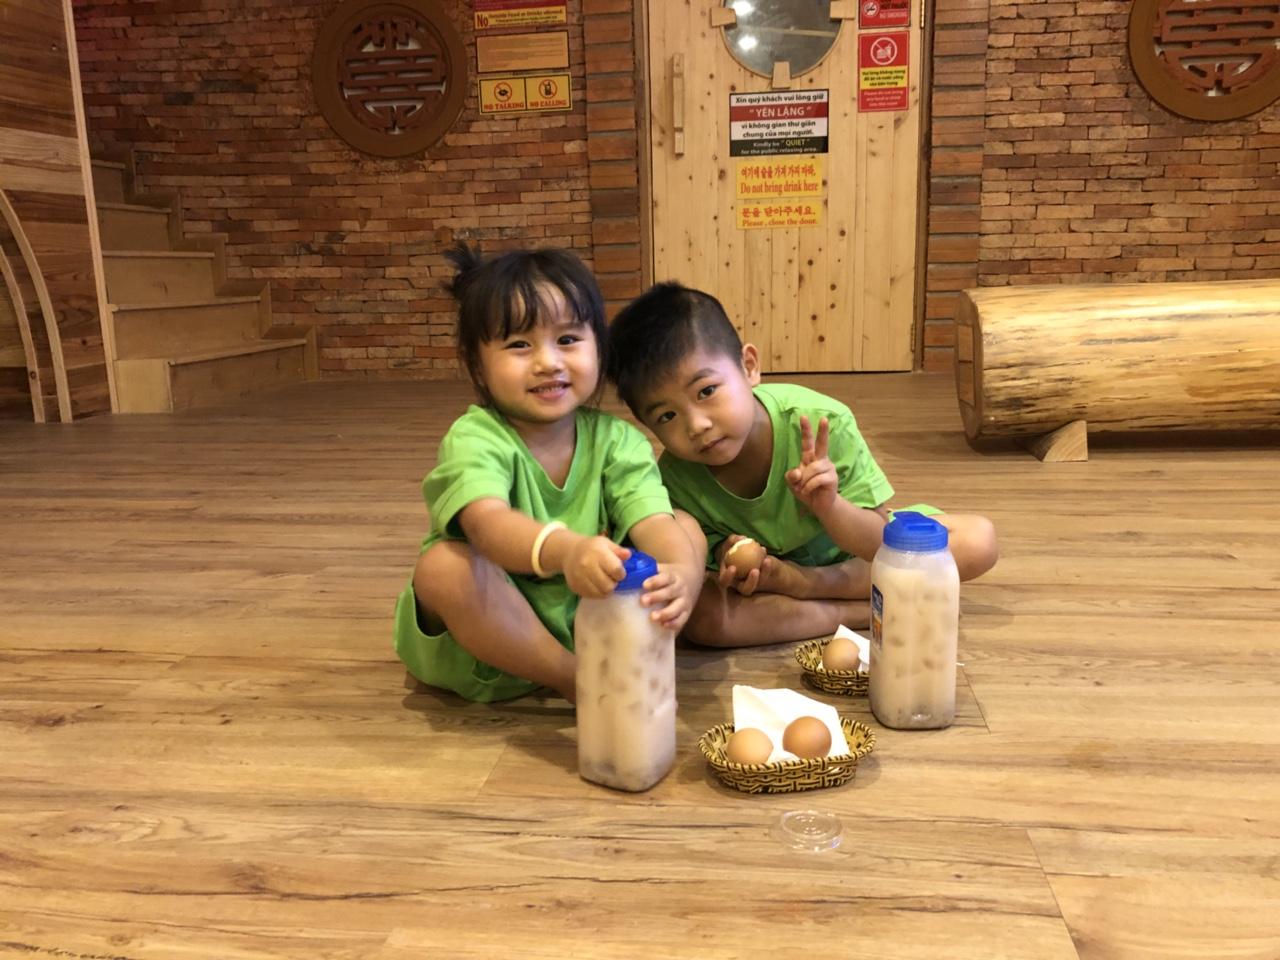 Gia Lai: ANAN Jjim Jil Bang Spa -  Điểm đến thư giãn hấp dẫn - Ảnh 8